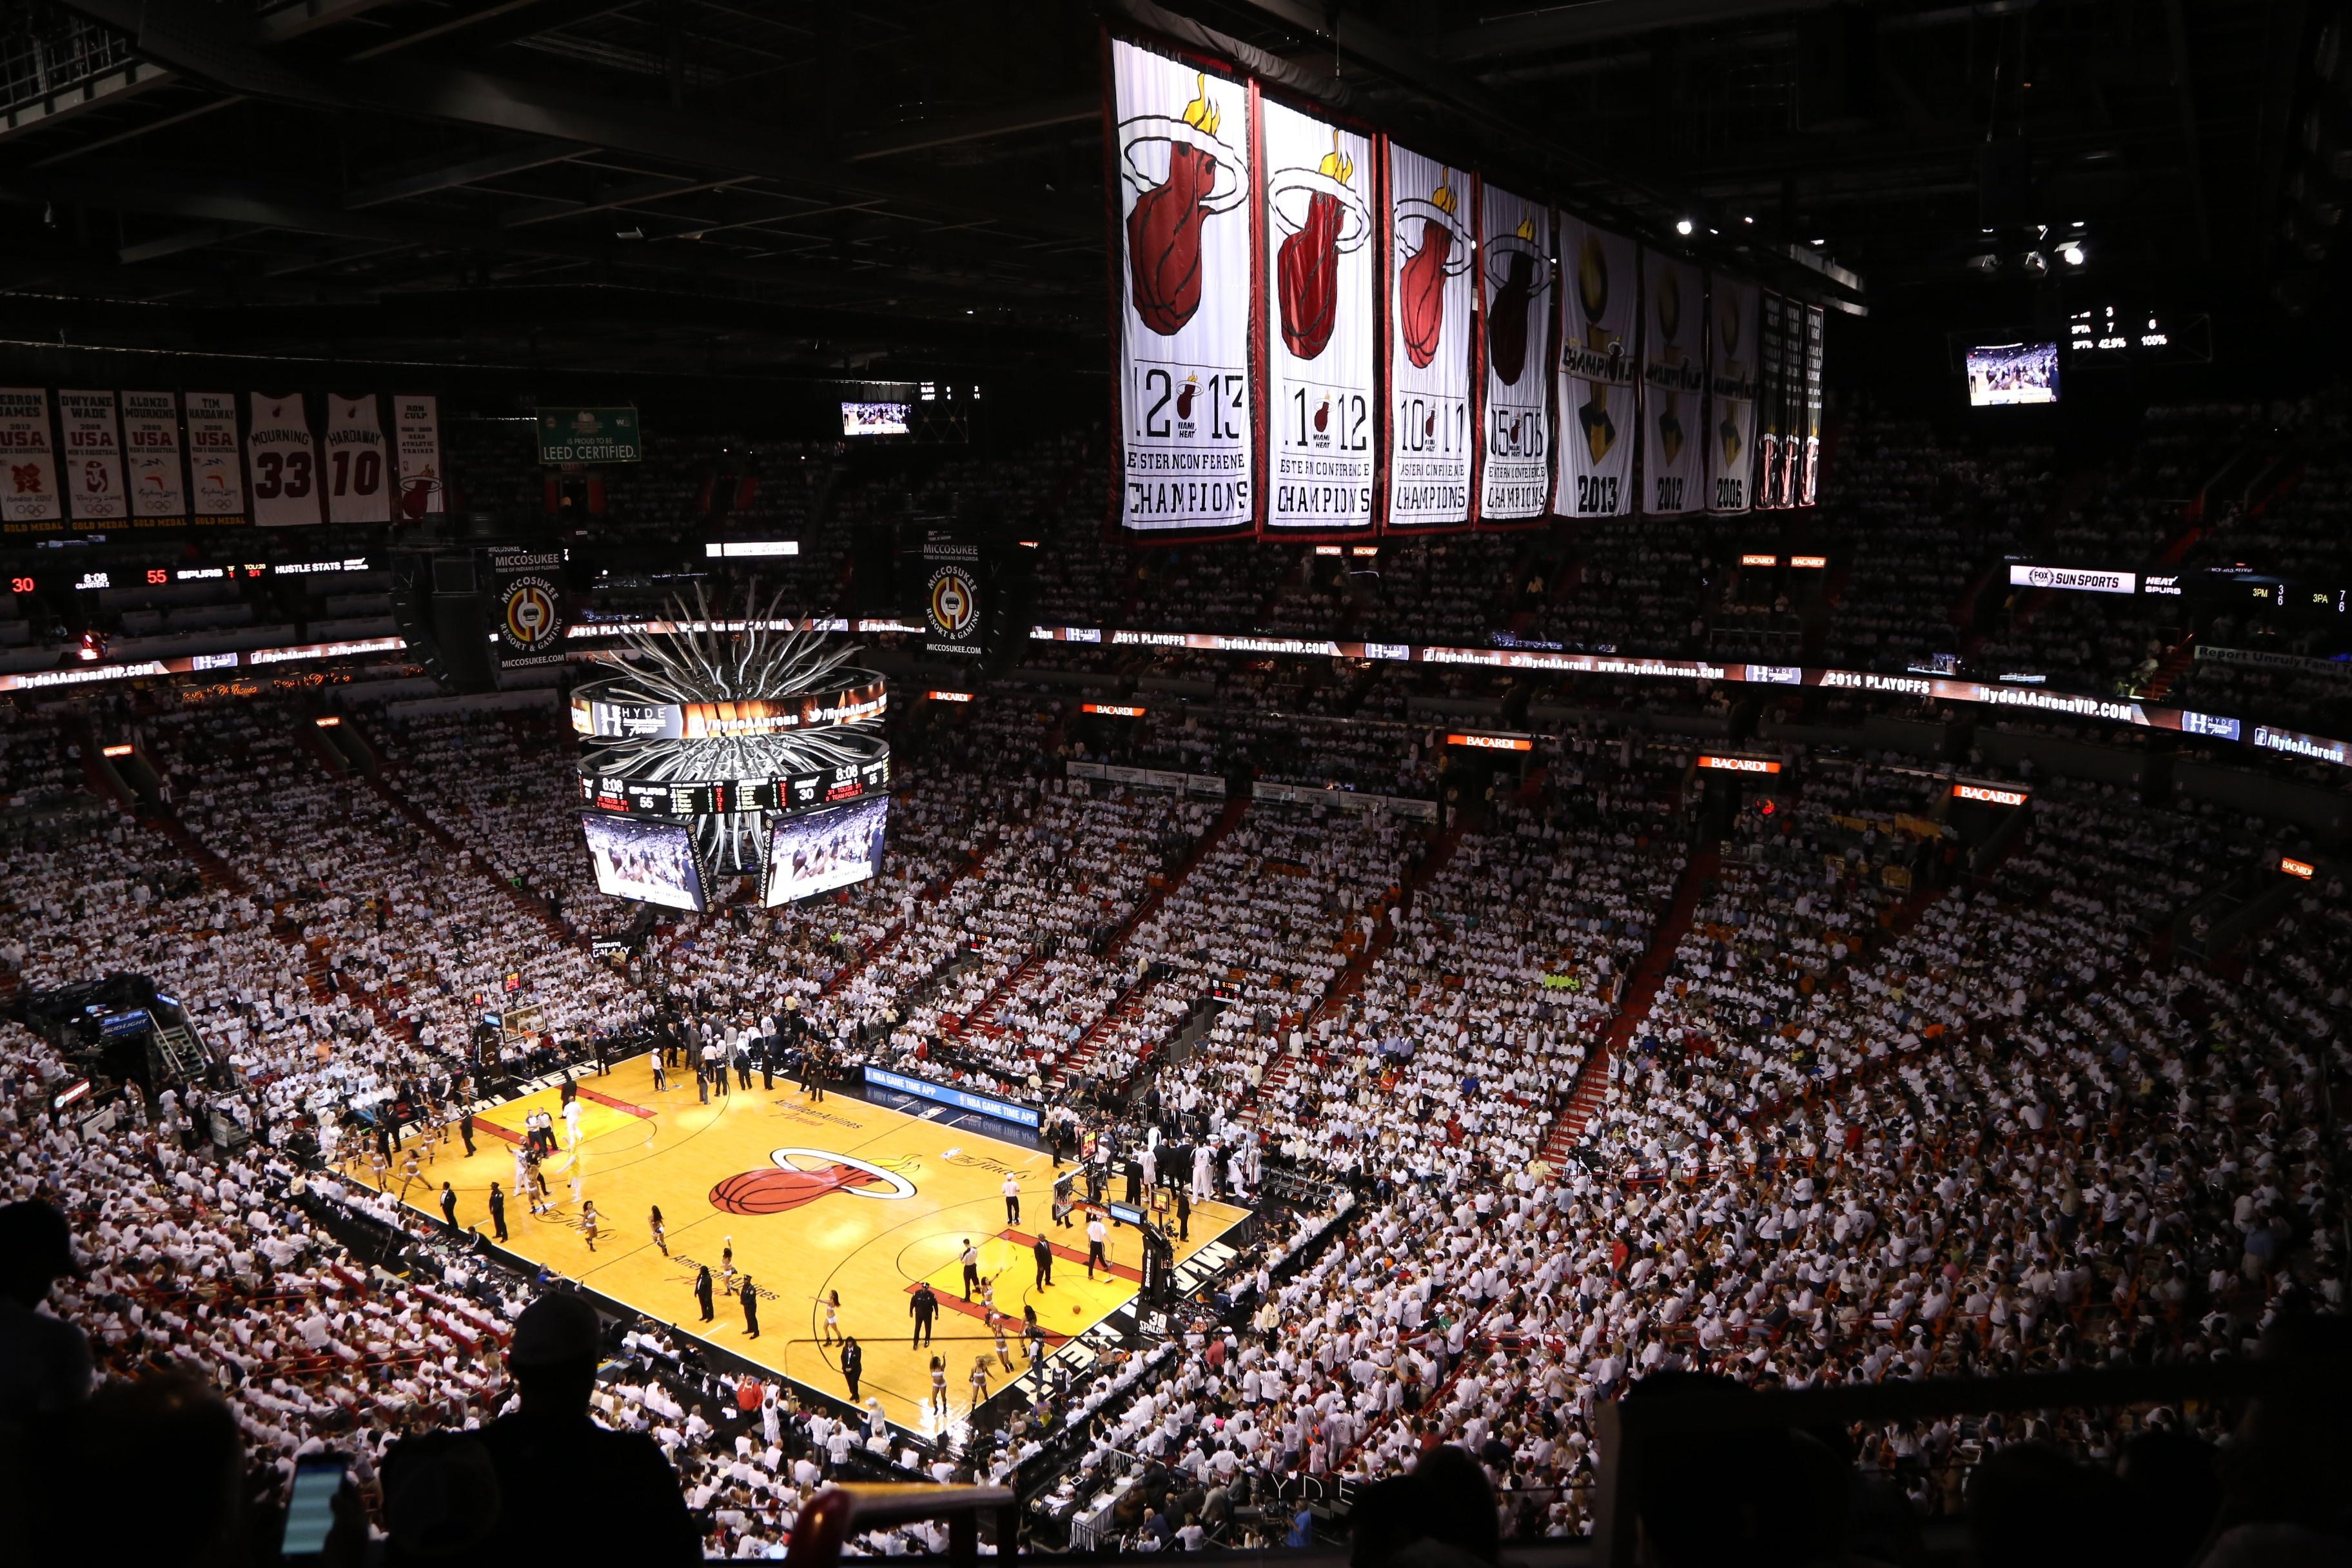 American Airlines Arena Install Eaton Ephesus Sports LED Tech For Miami HEAT NBA Games - SportsTechie blog, Photo Credit David Alvarez/Miami HEAT.